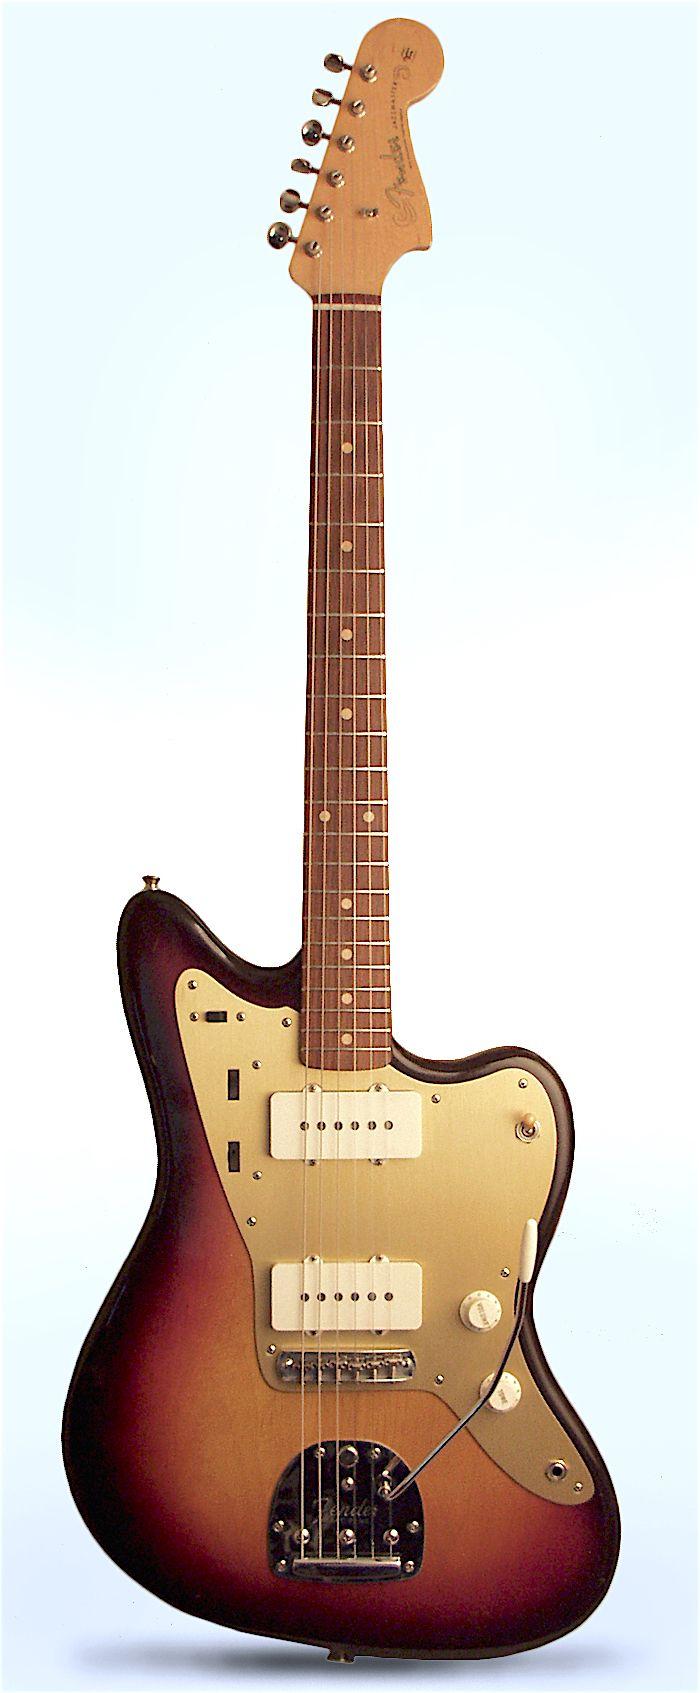 Fender Jazzmaster Solid Body Electric Guitar 1959 Guitar Fender Guitars Electric Guitar